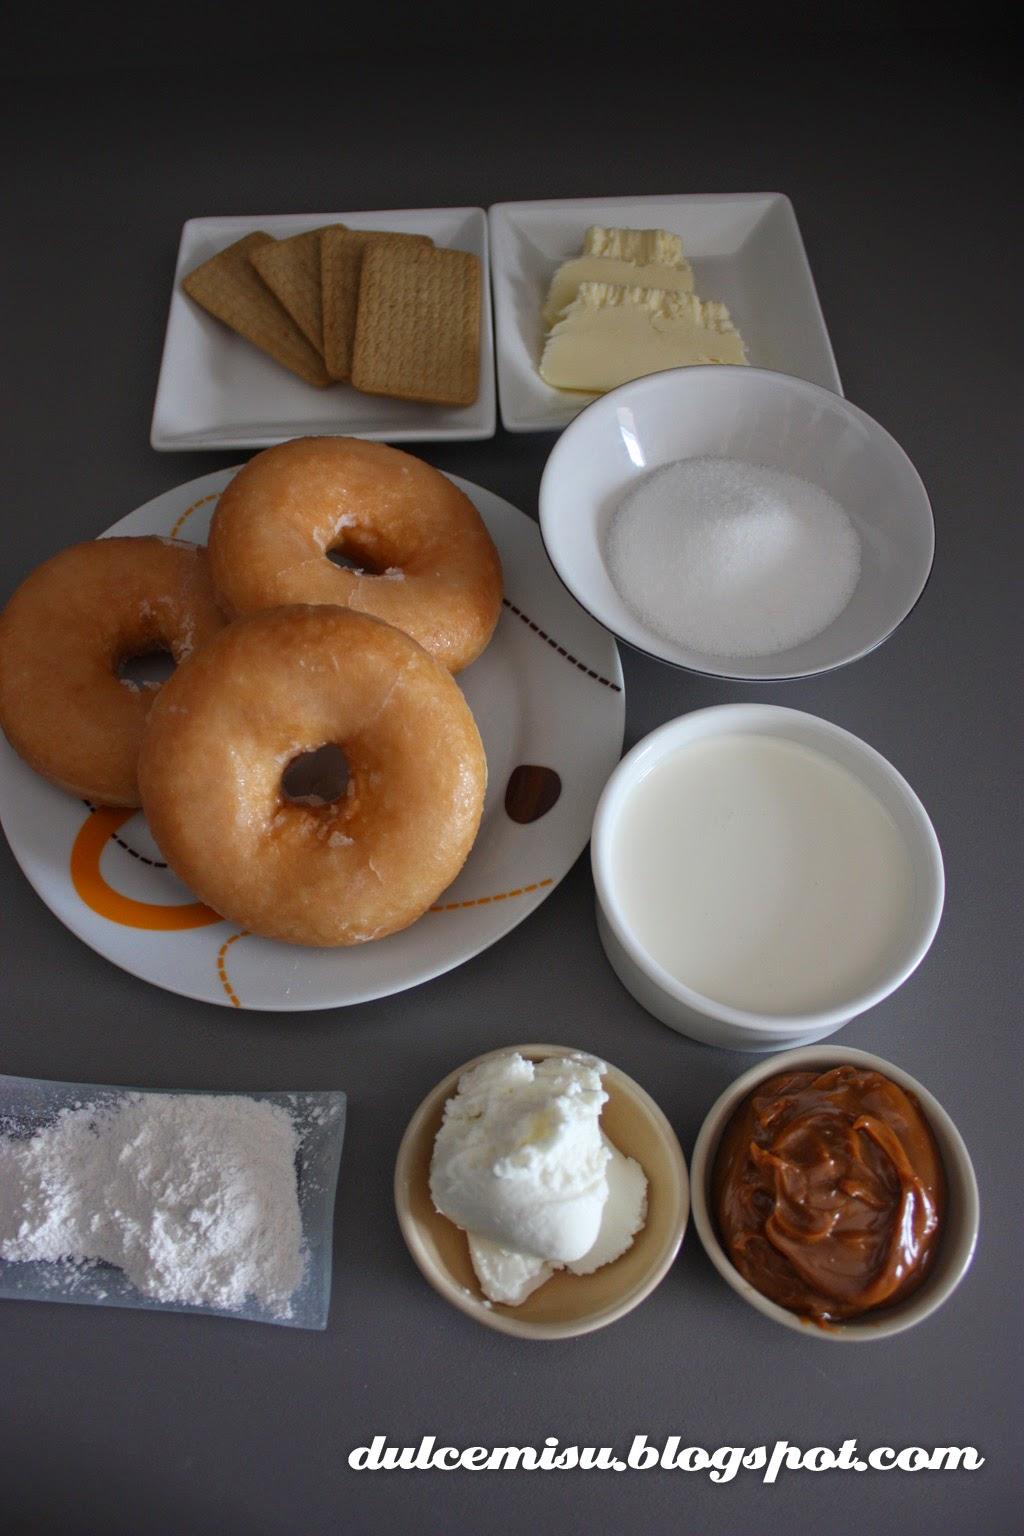 tarta donuts, dulce de leche, boquilla, manga pastelera, nata líquida, mantequilla, donuts, recetas, dulcemisu